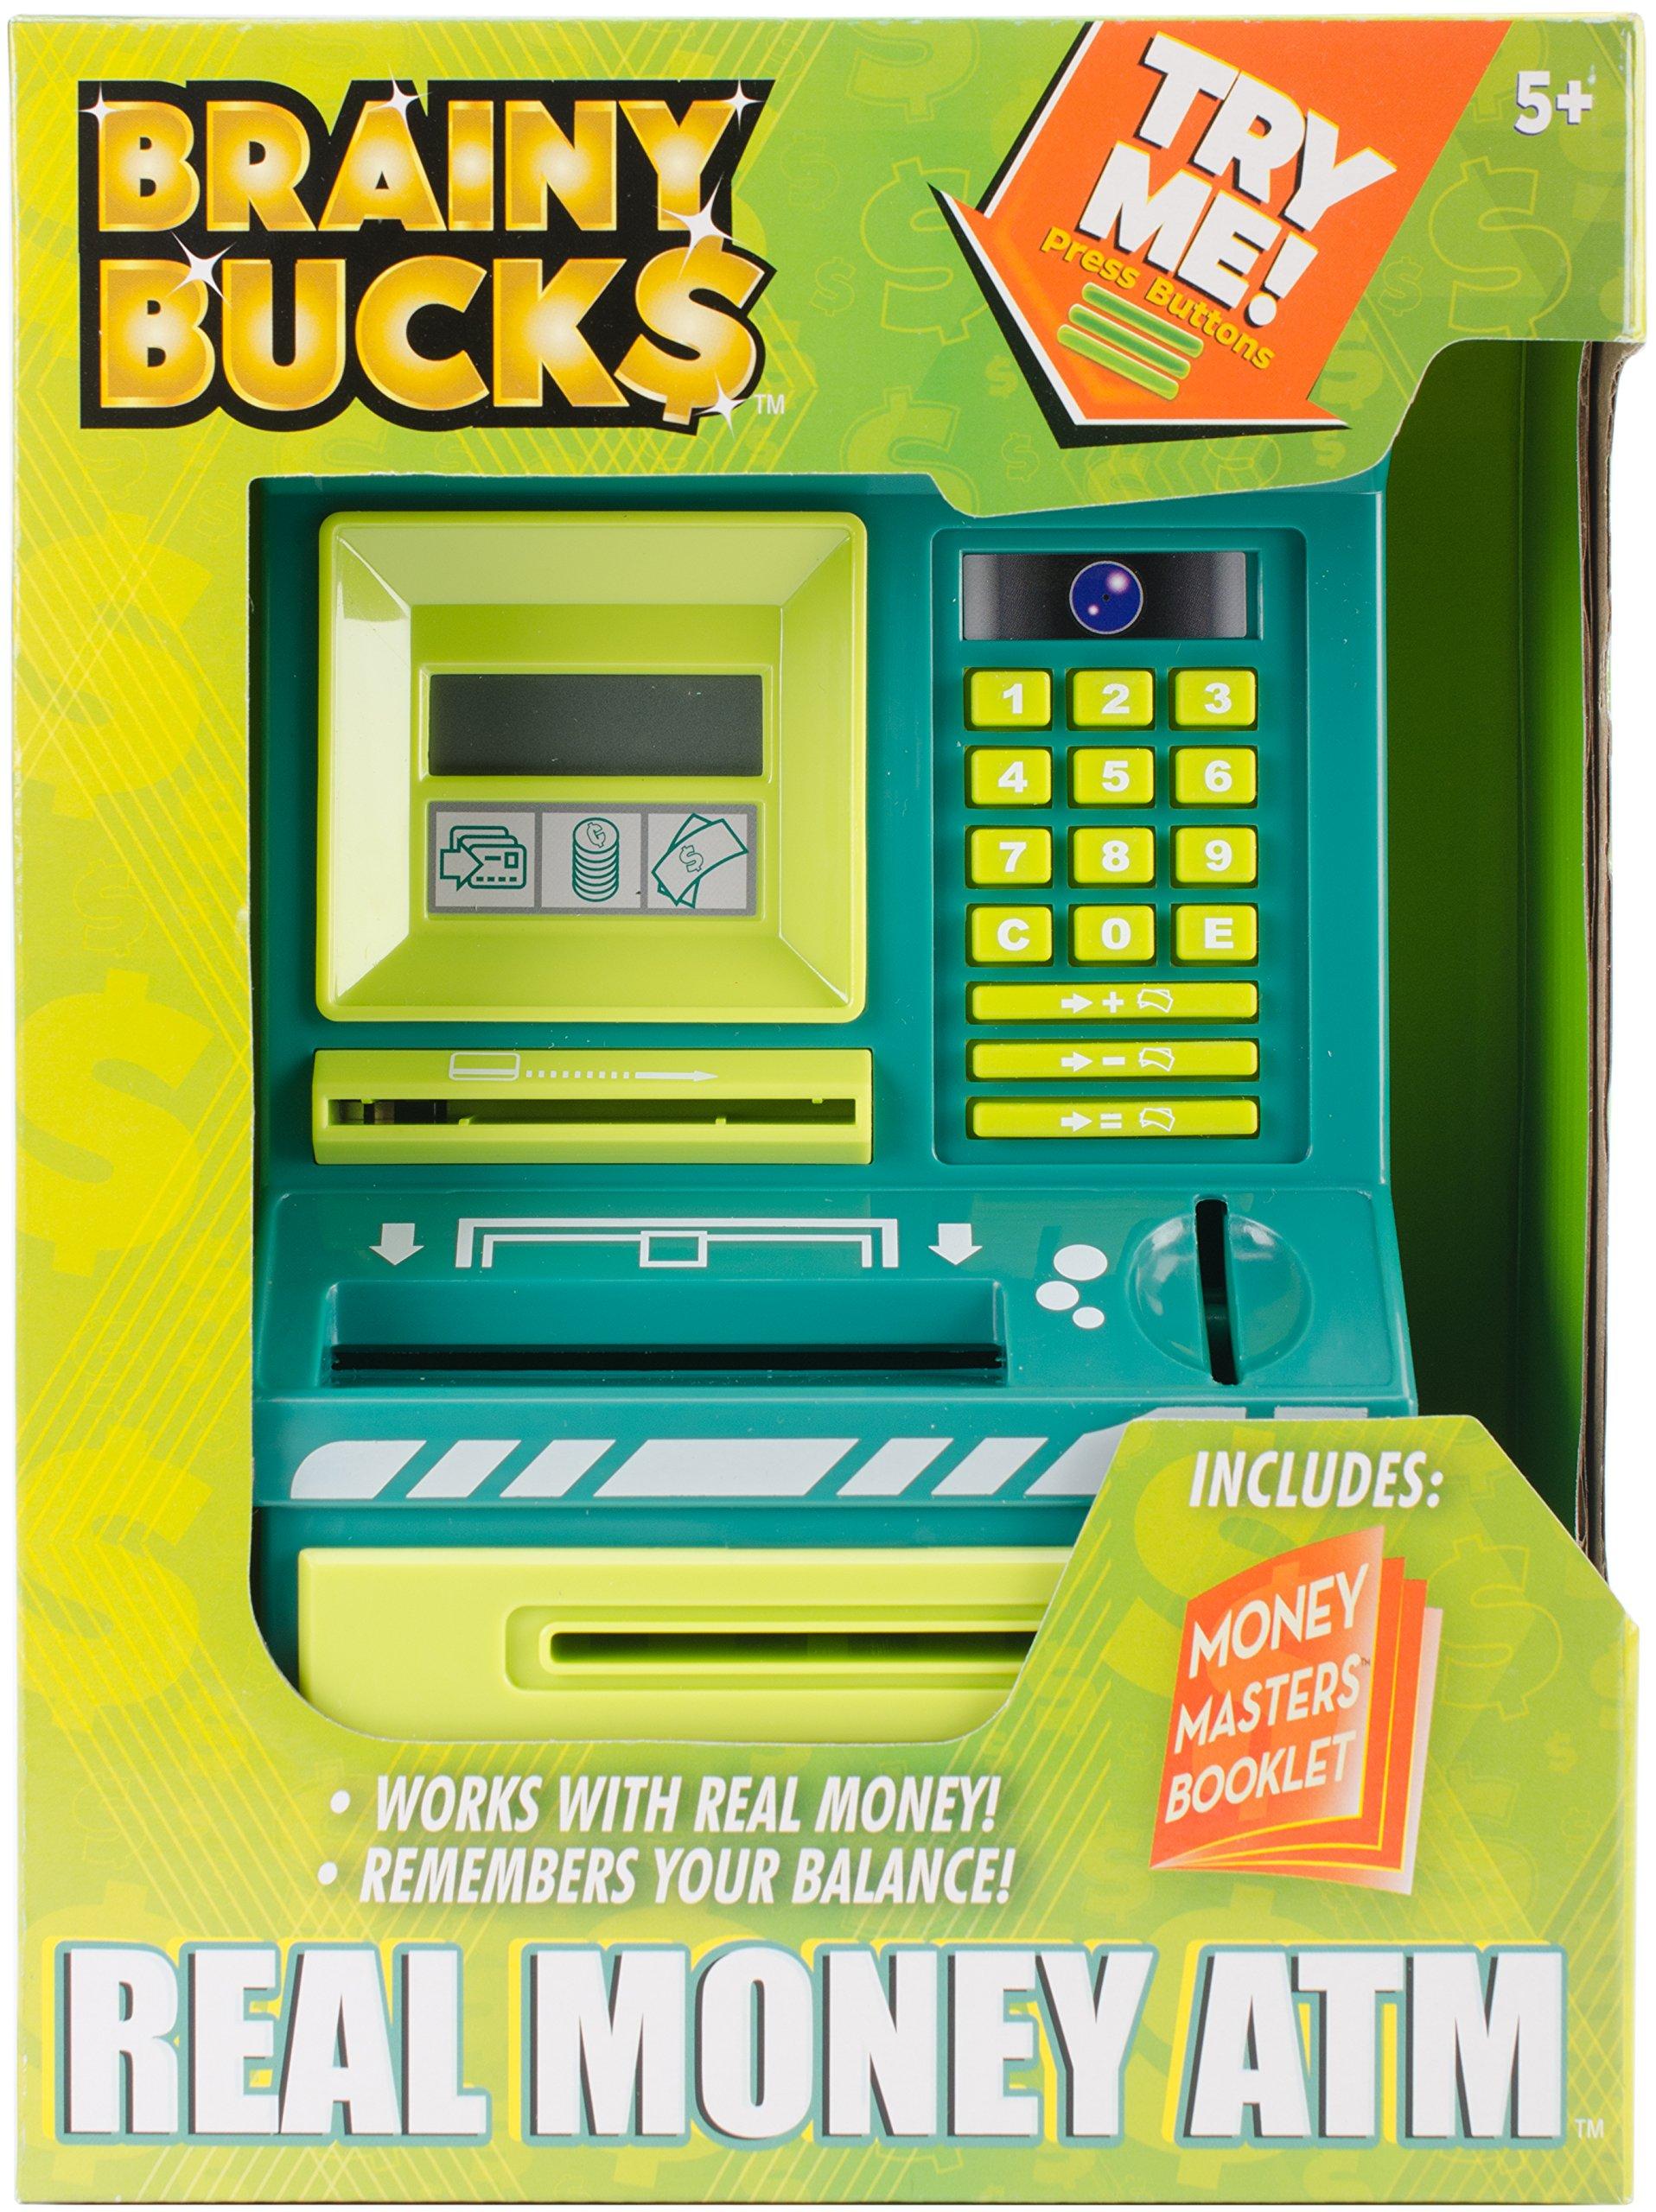 Brainy Bucks Real Money ATM Toy